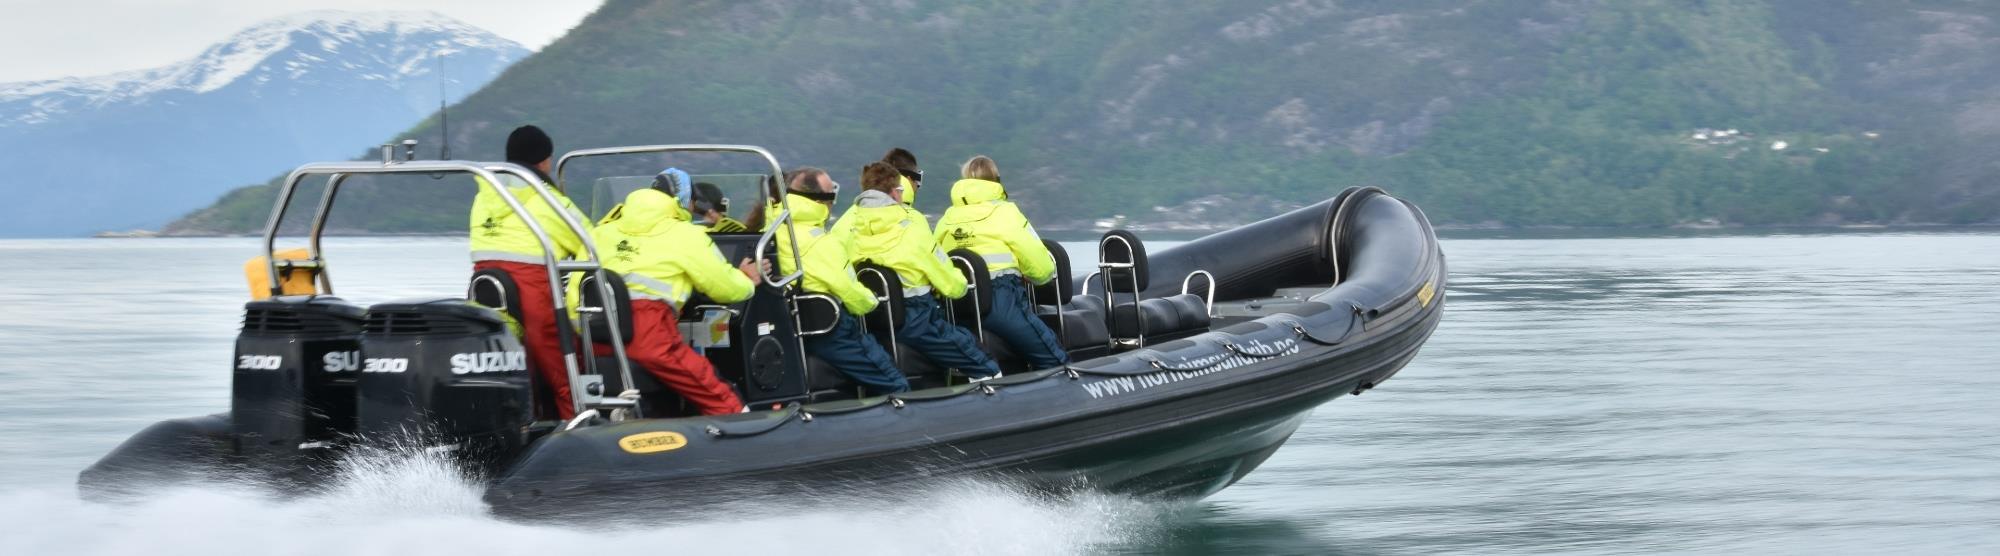 Norgesferie ungdom - Norheimsund RIB Seafari